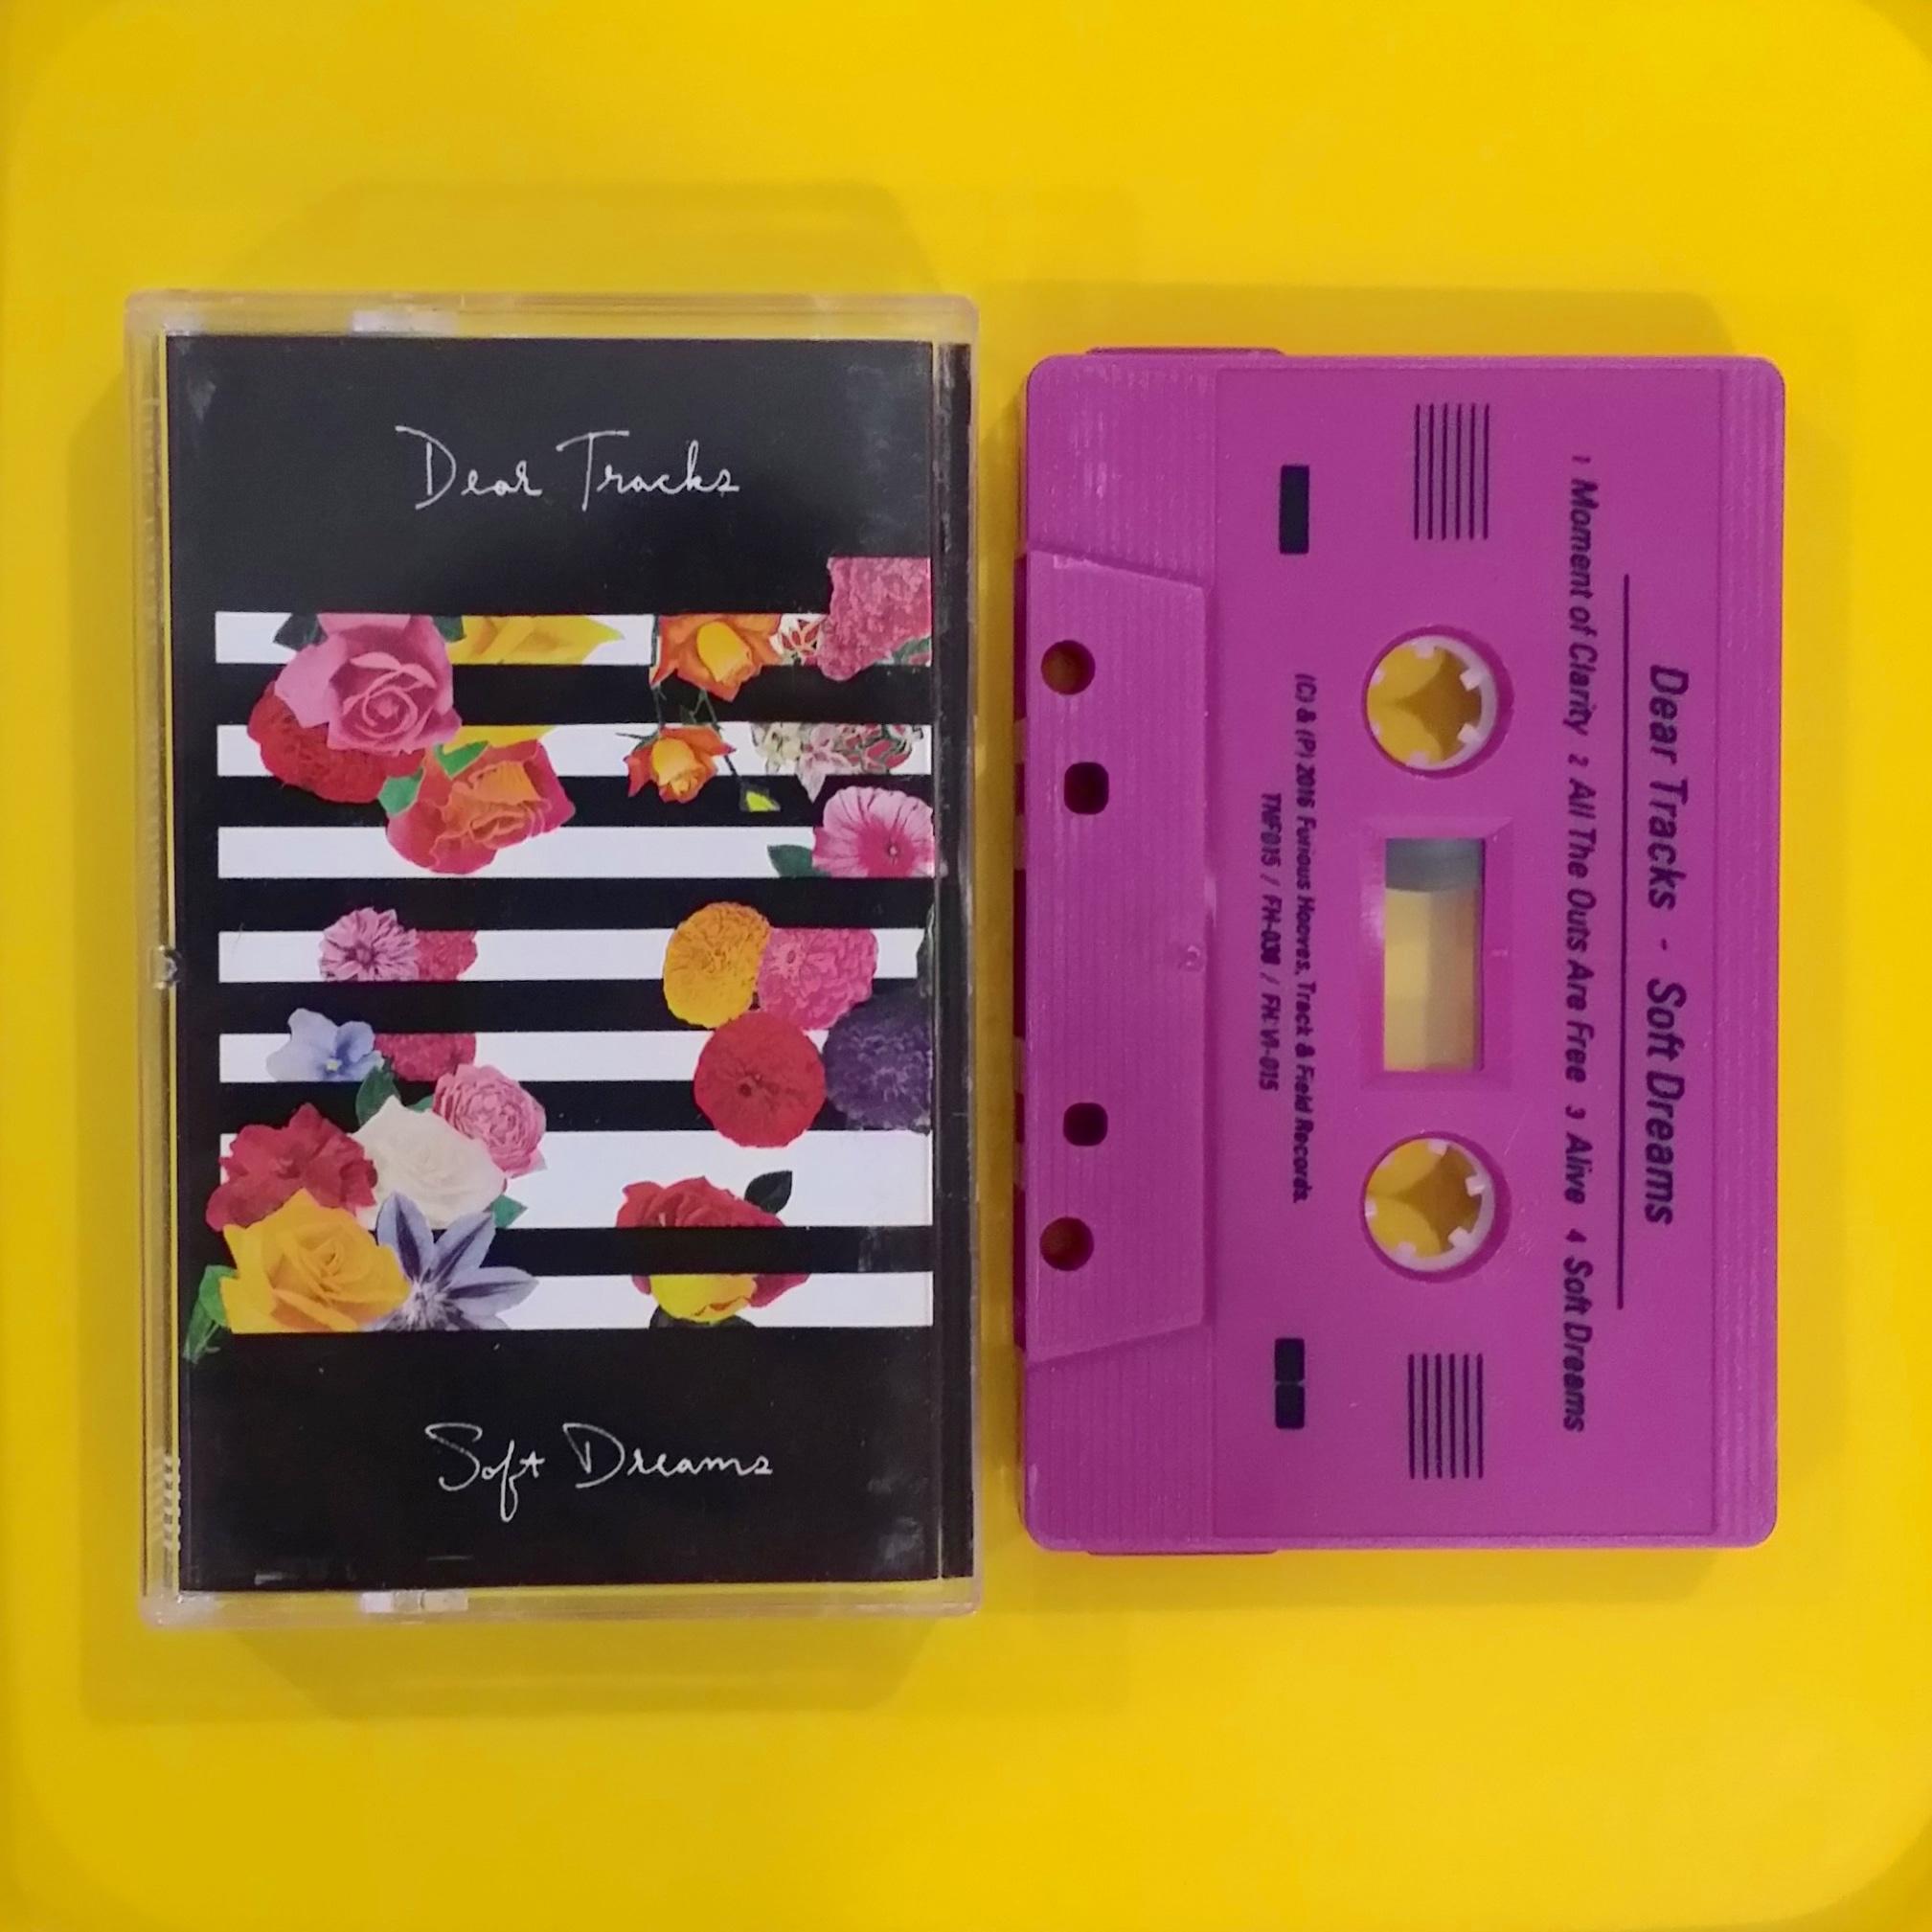 Dear Tracks - Soft Dreams (Track and Field Records)